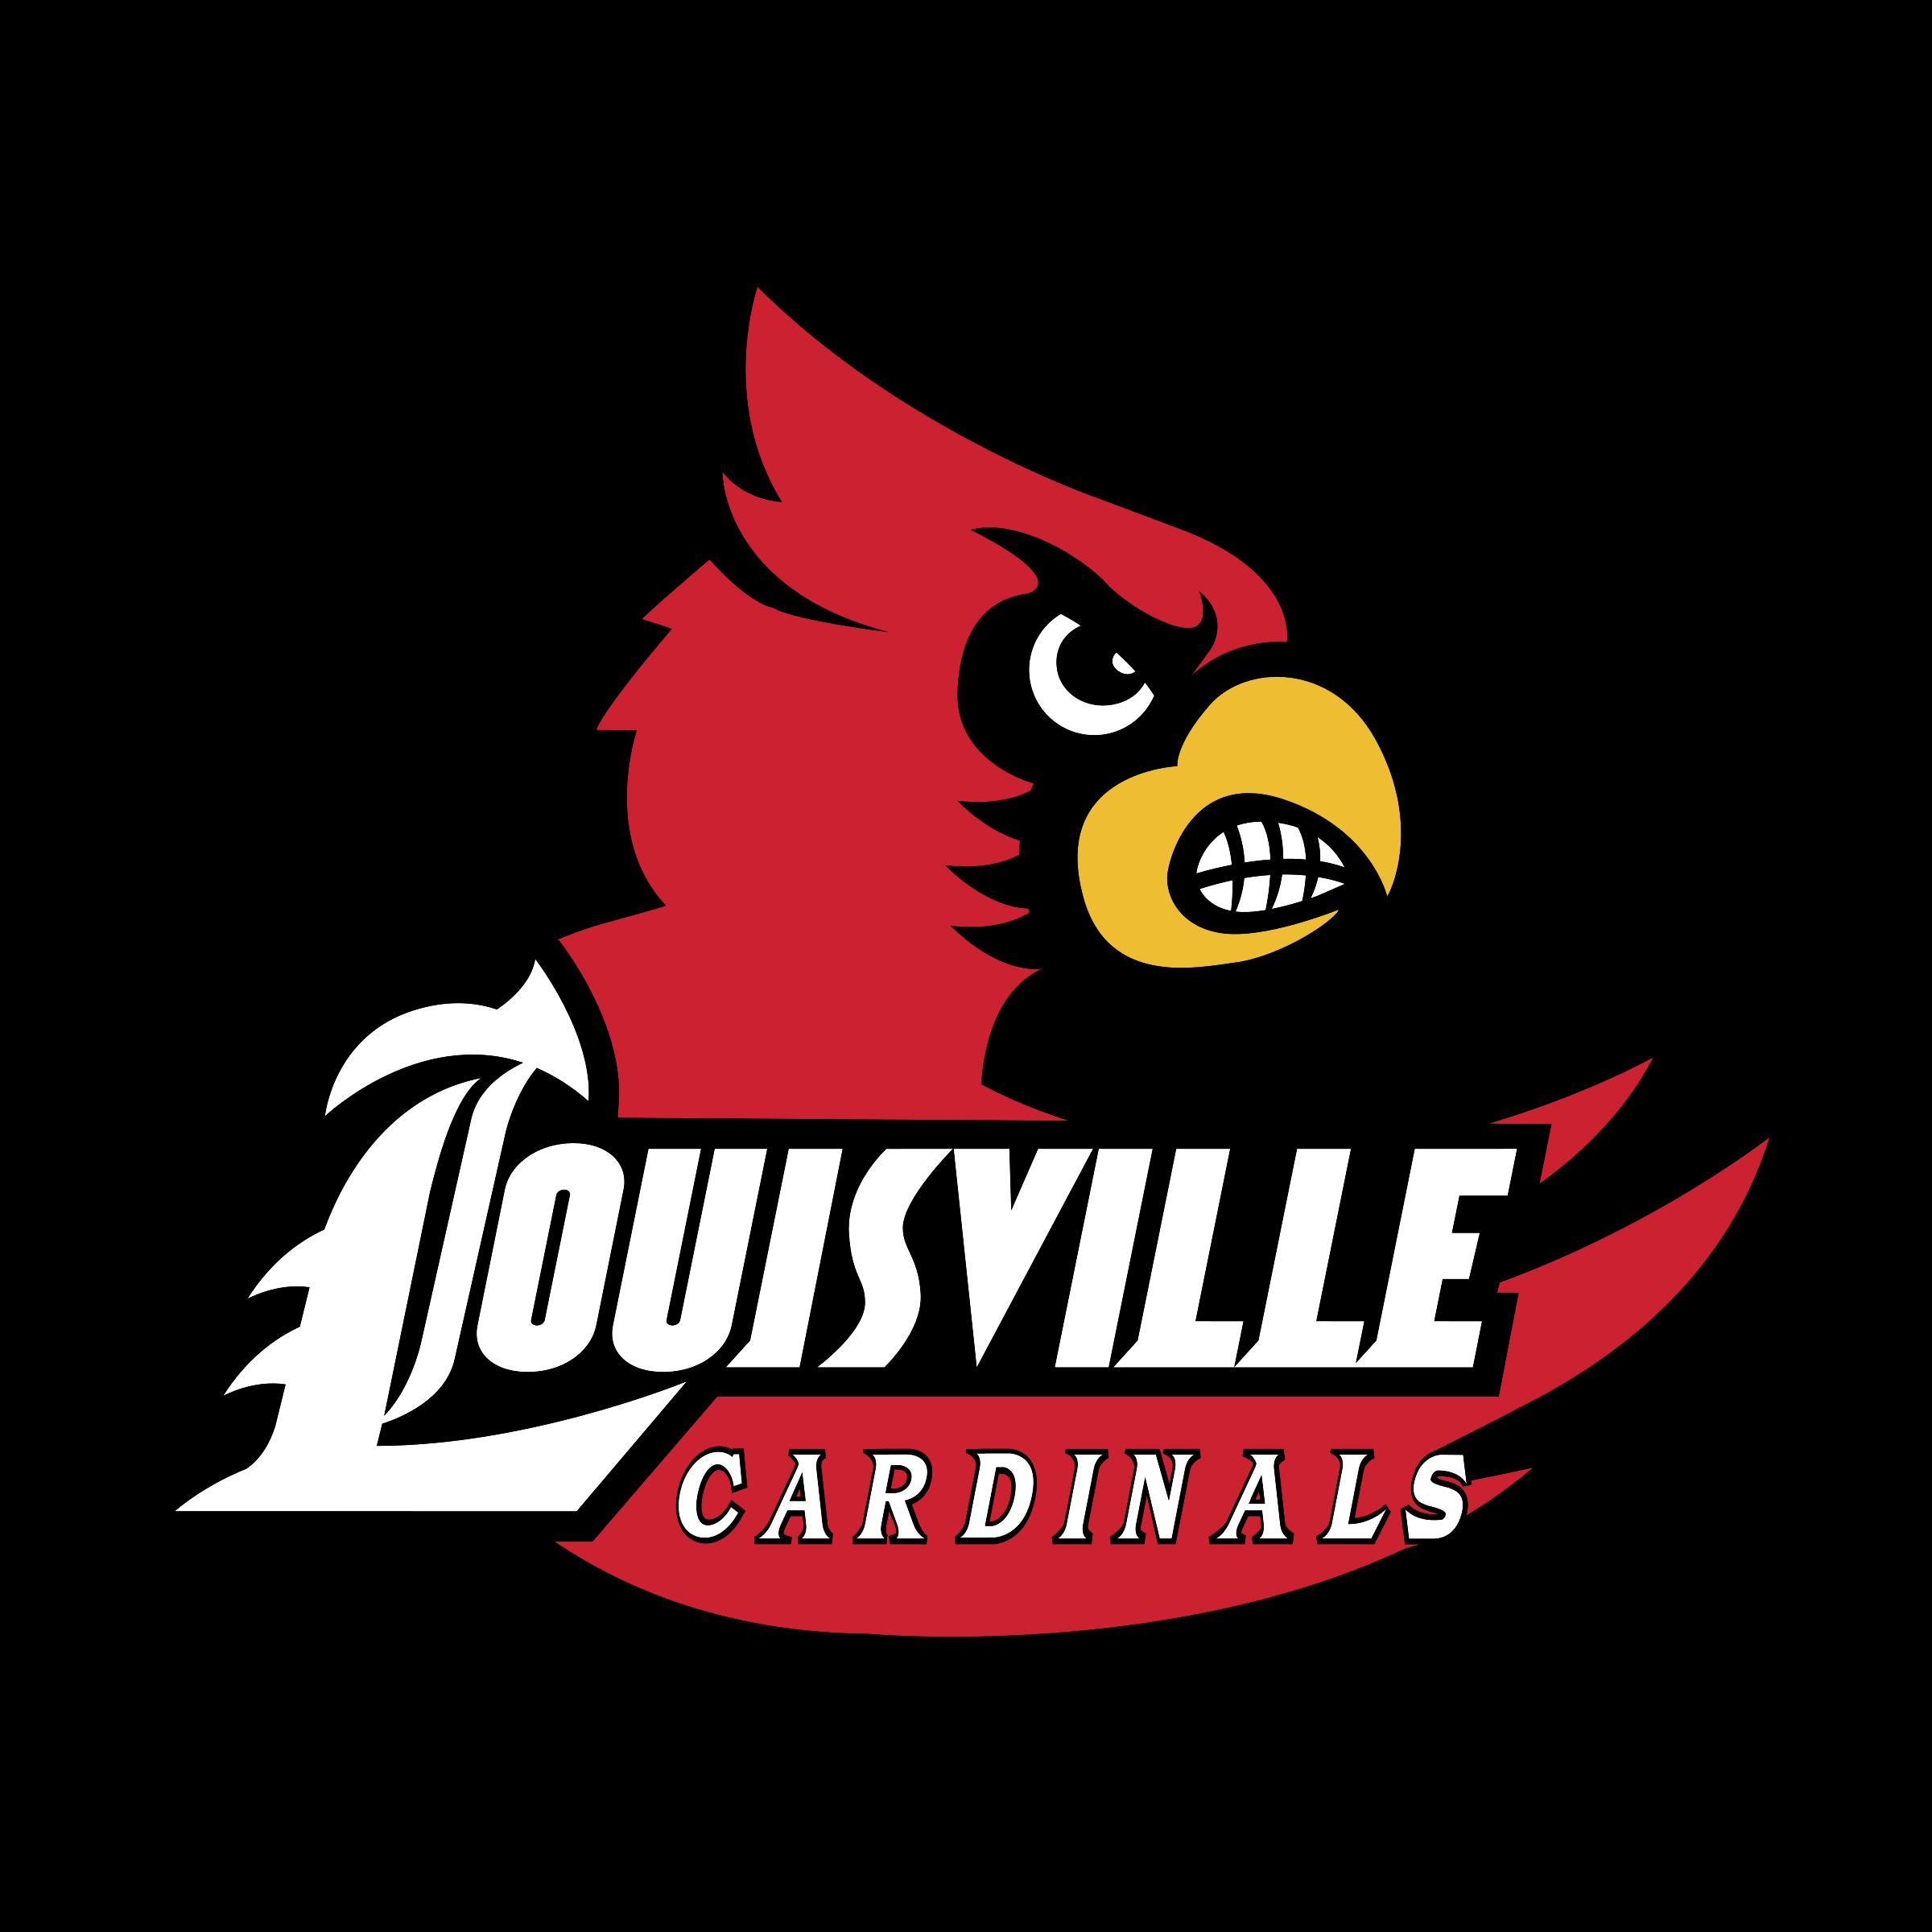 Louisville Cardinals Logo PNG Transparent & SVG Vector - Freebie Supply